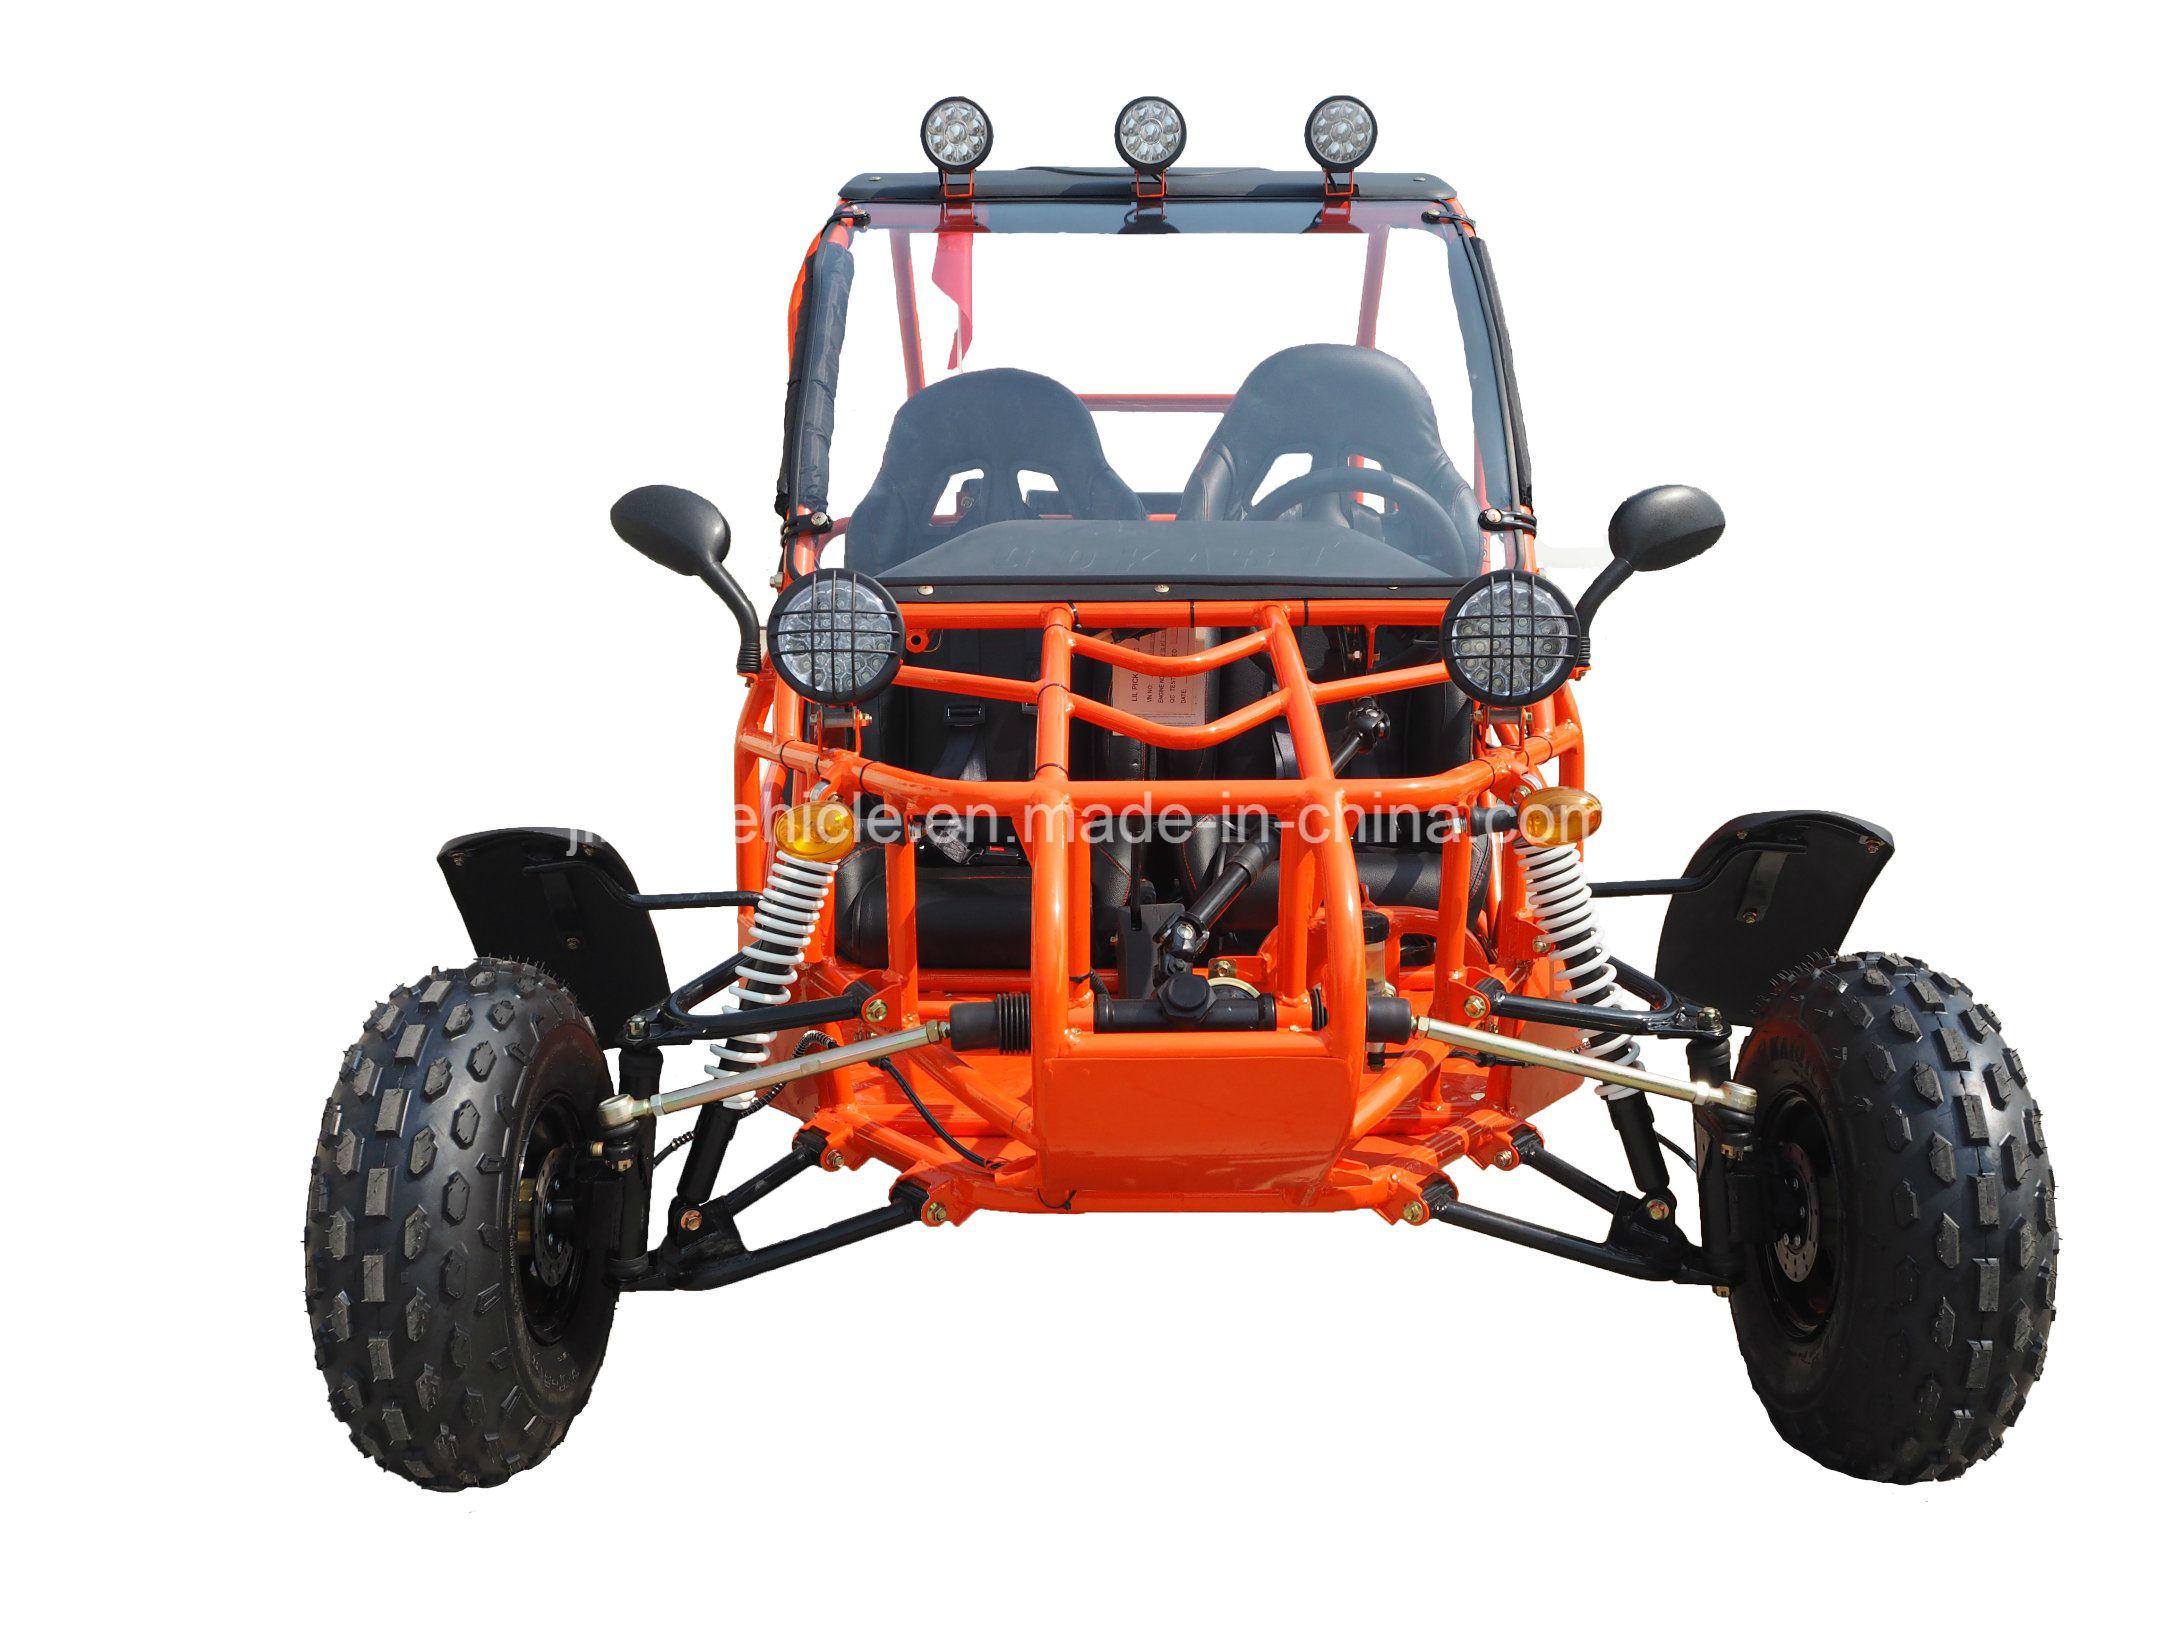 EPA Approved 800cc ATV Sport ATV